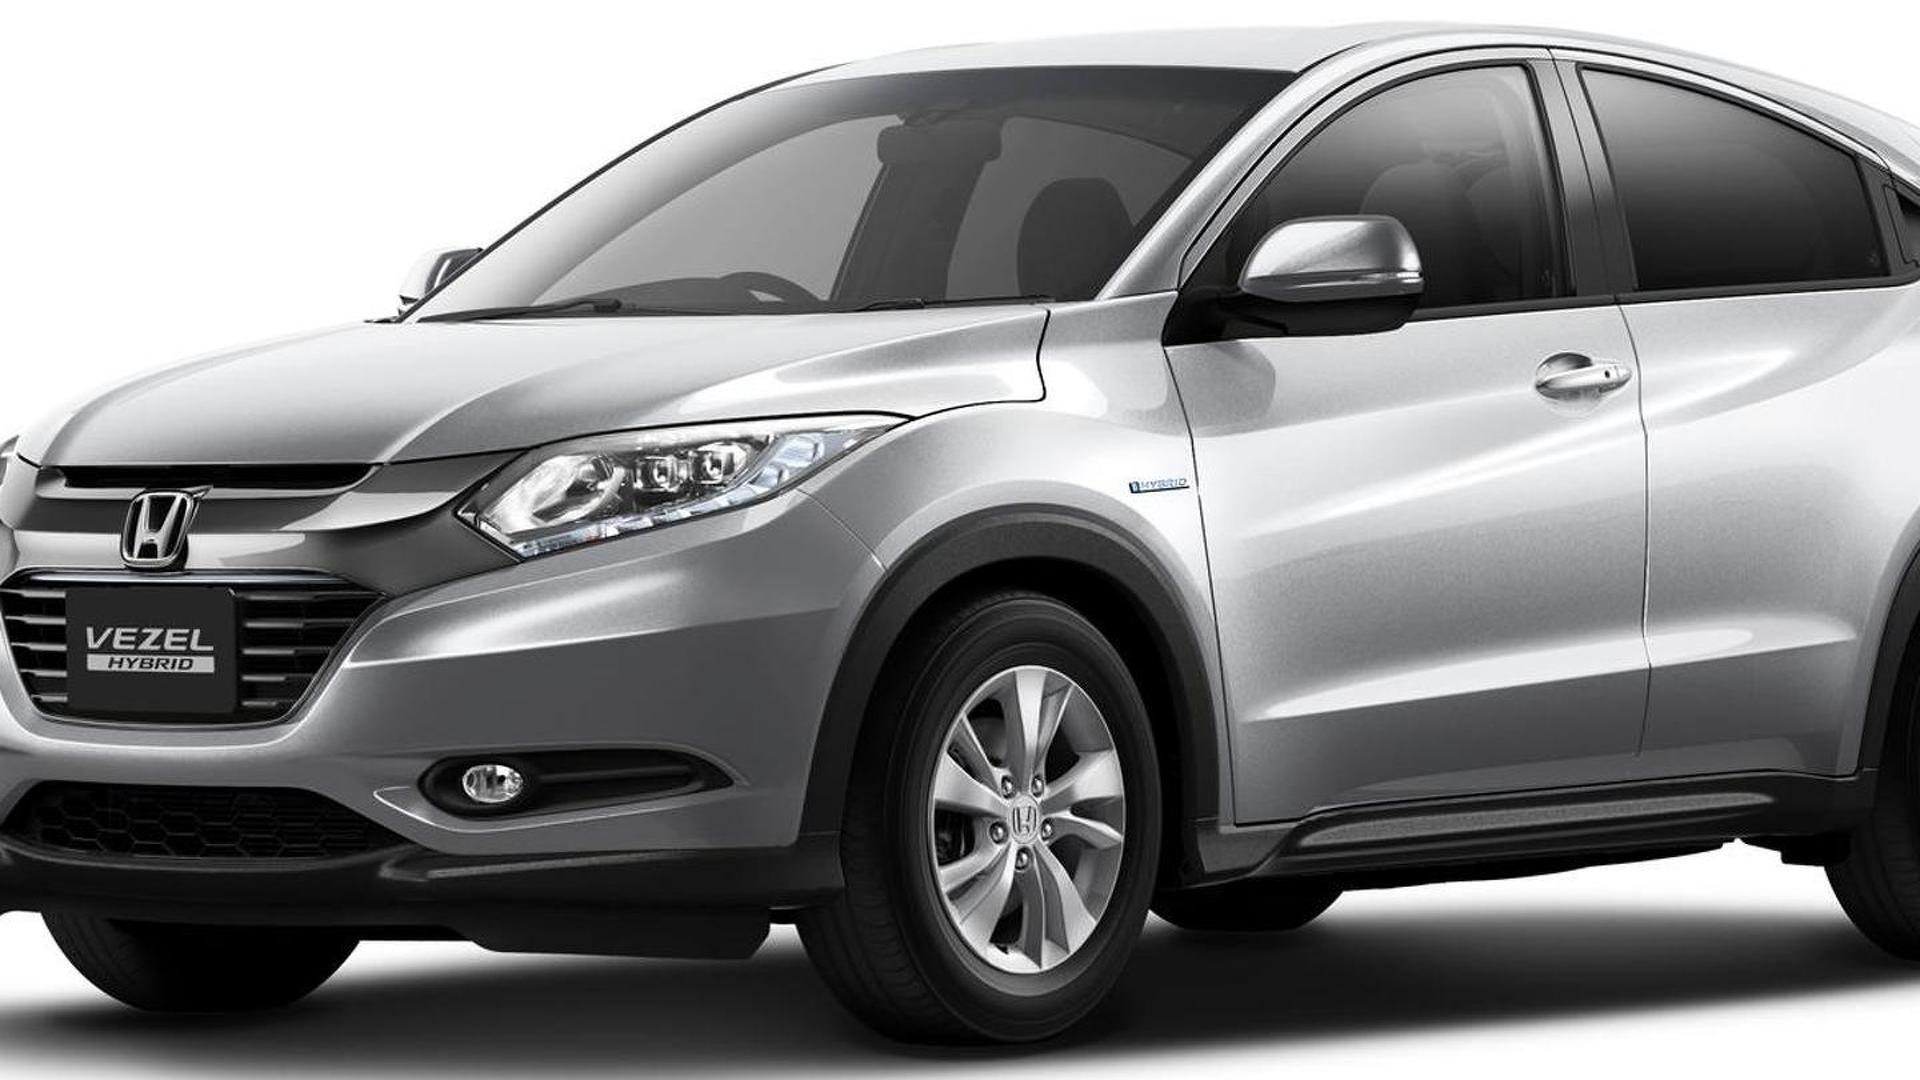 Honda Vezel to receive HR-V nameplate in United States - report